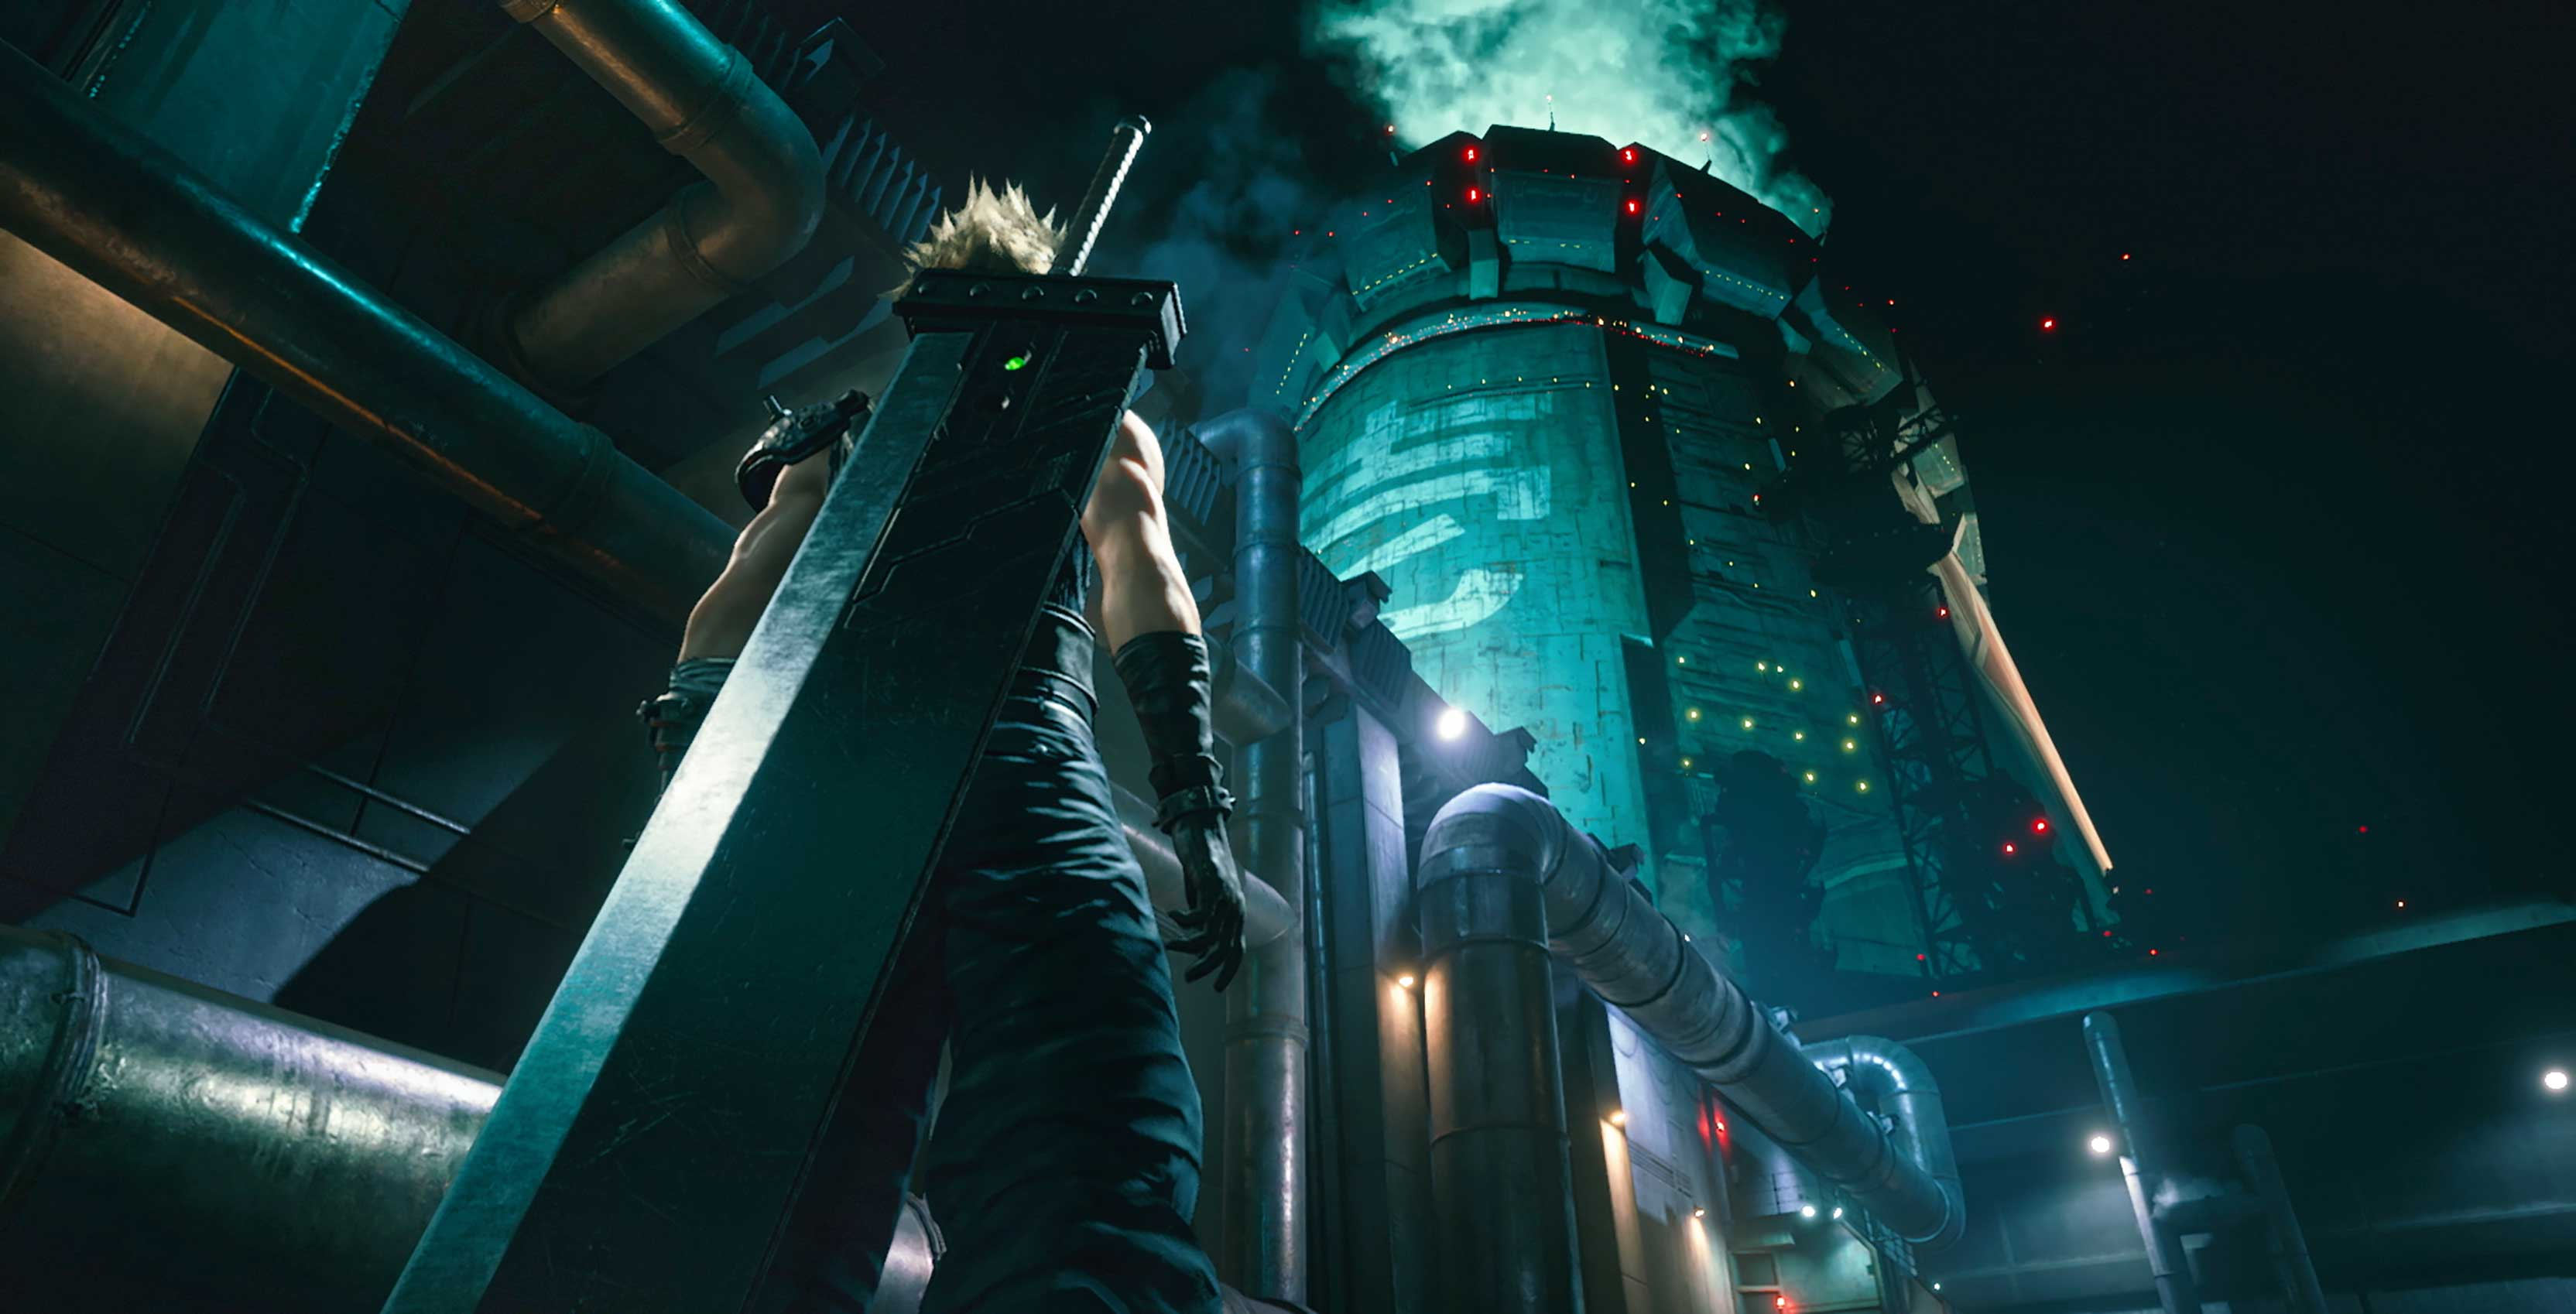 Final Fantasy VII Remake Shinra building